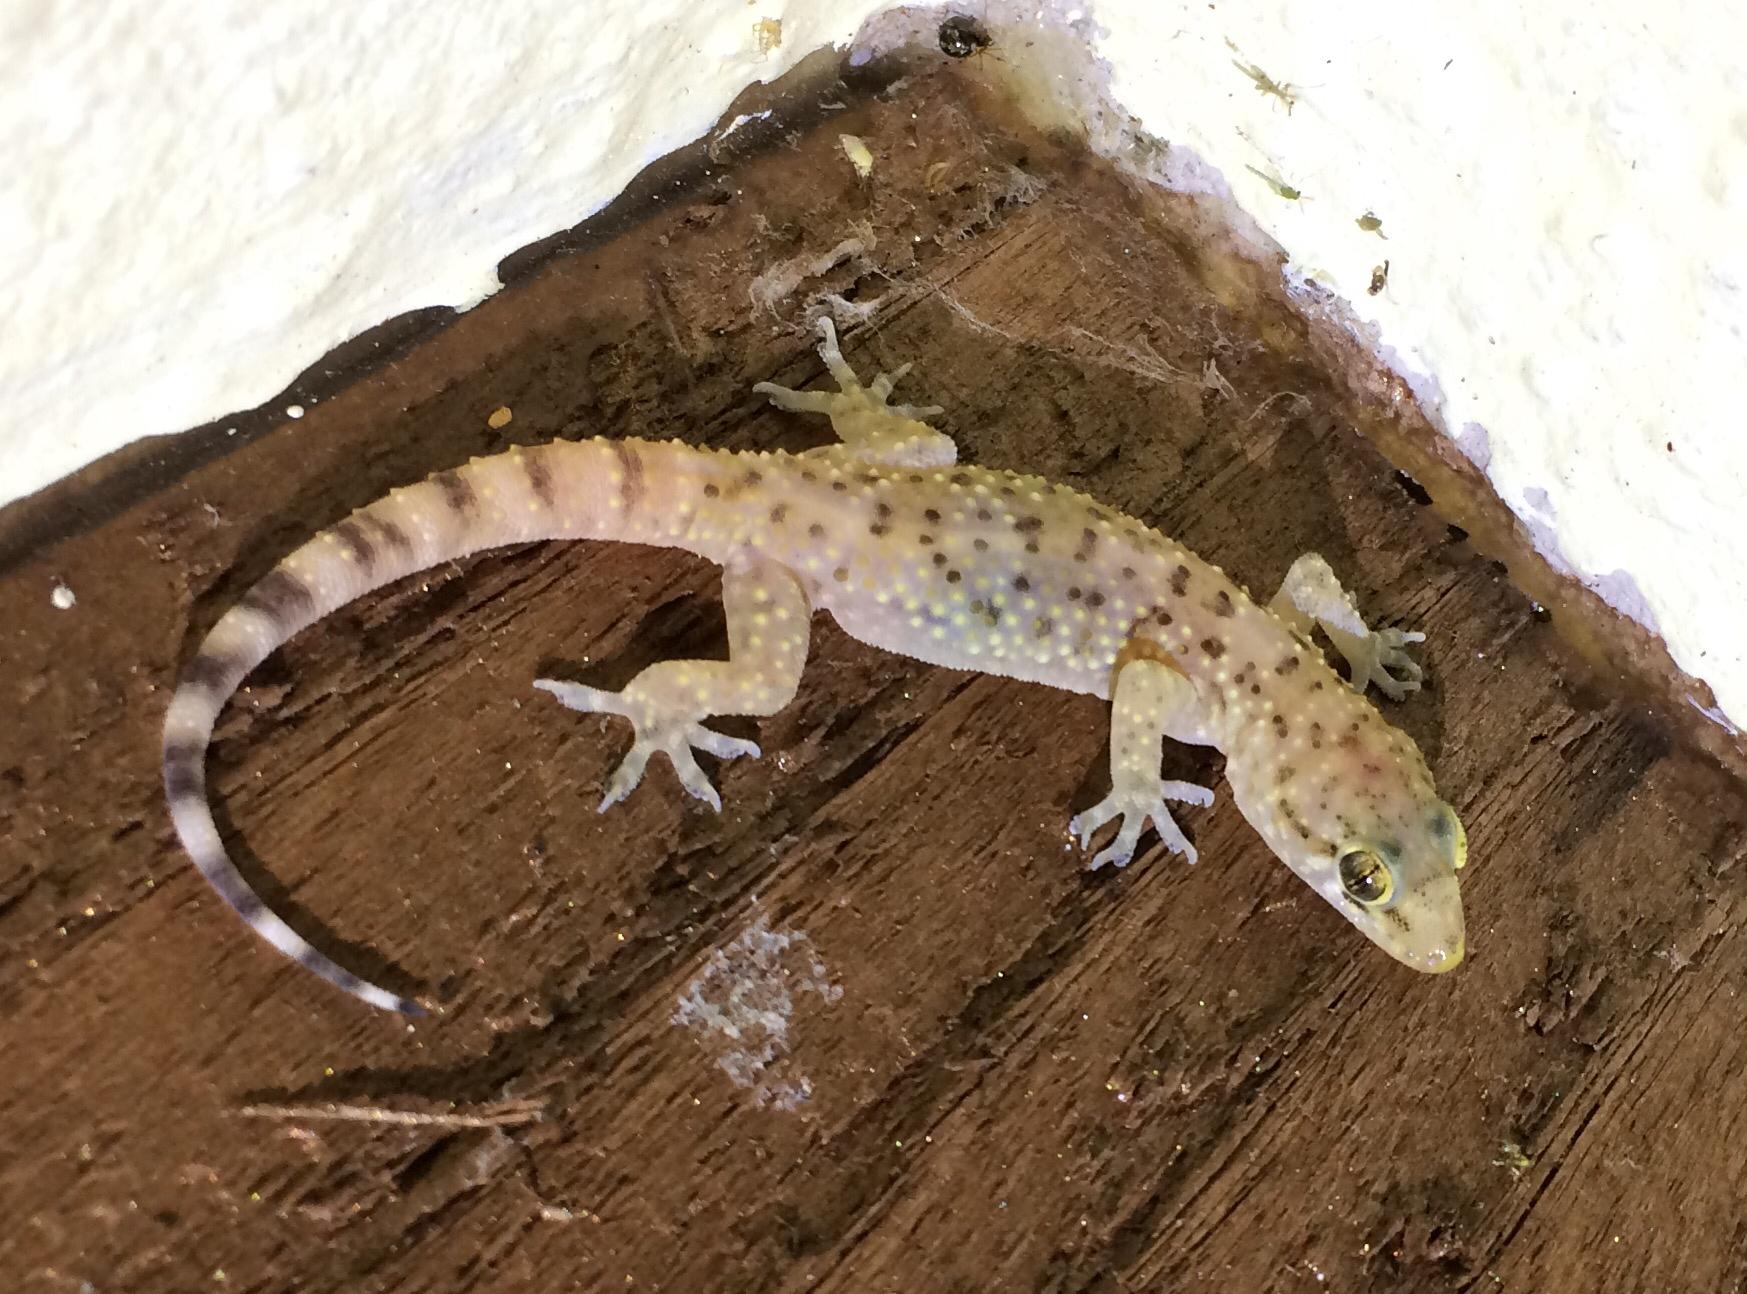 Mediterranean House Gecko Hemidactylus Turcicus Inaturalist Org